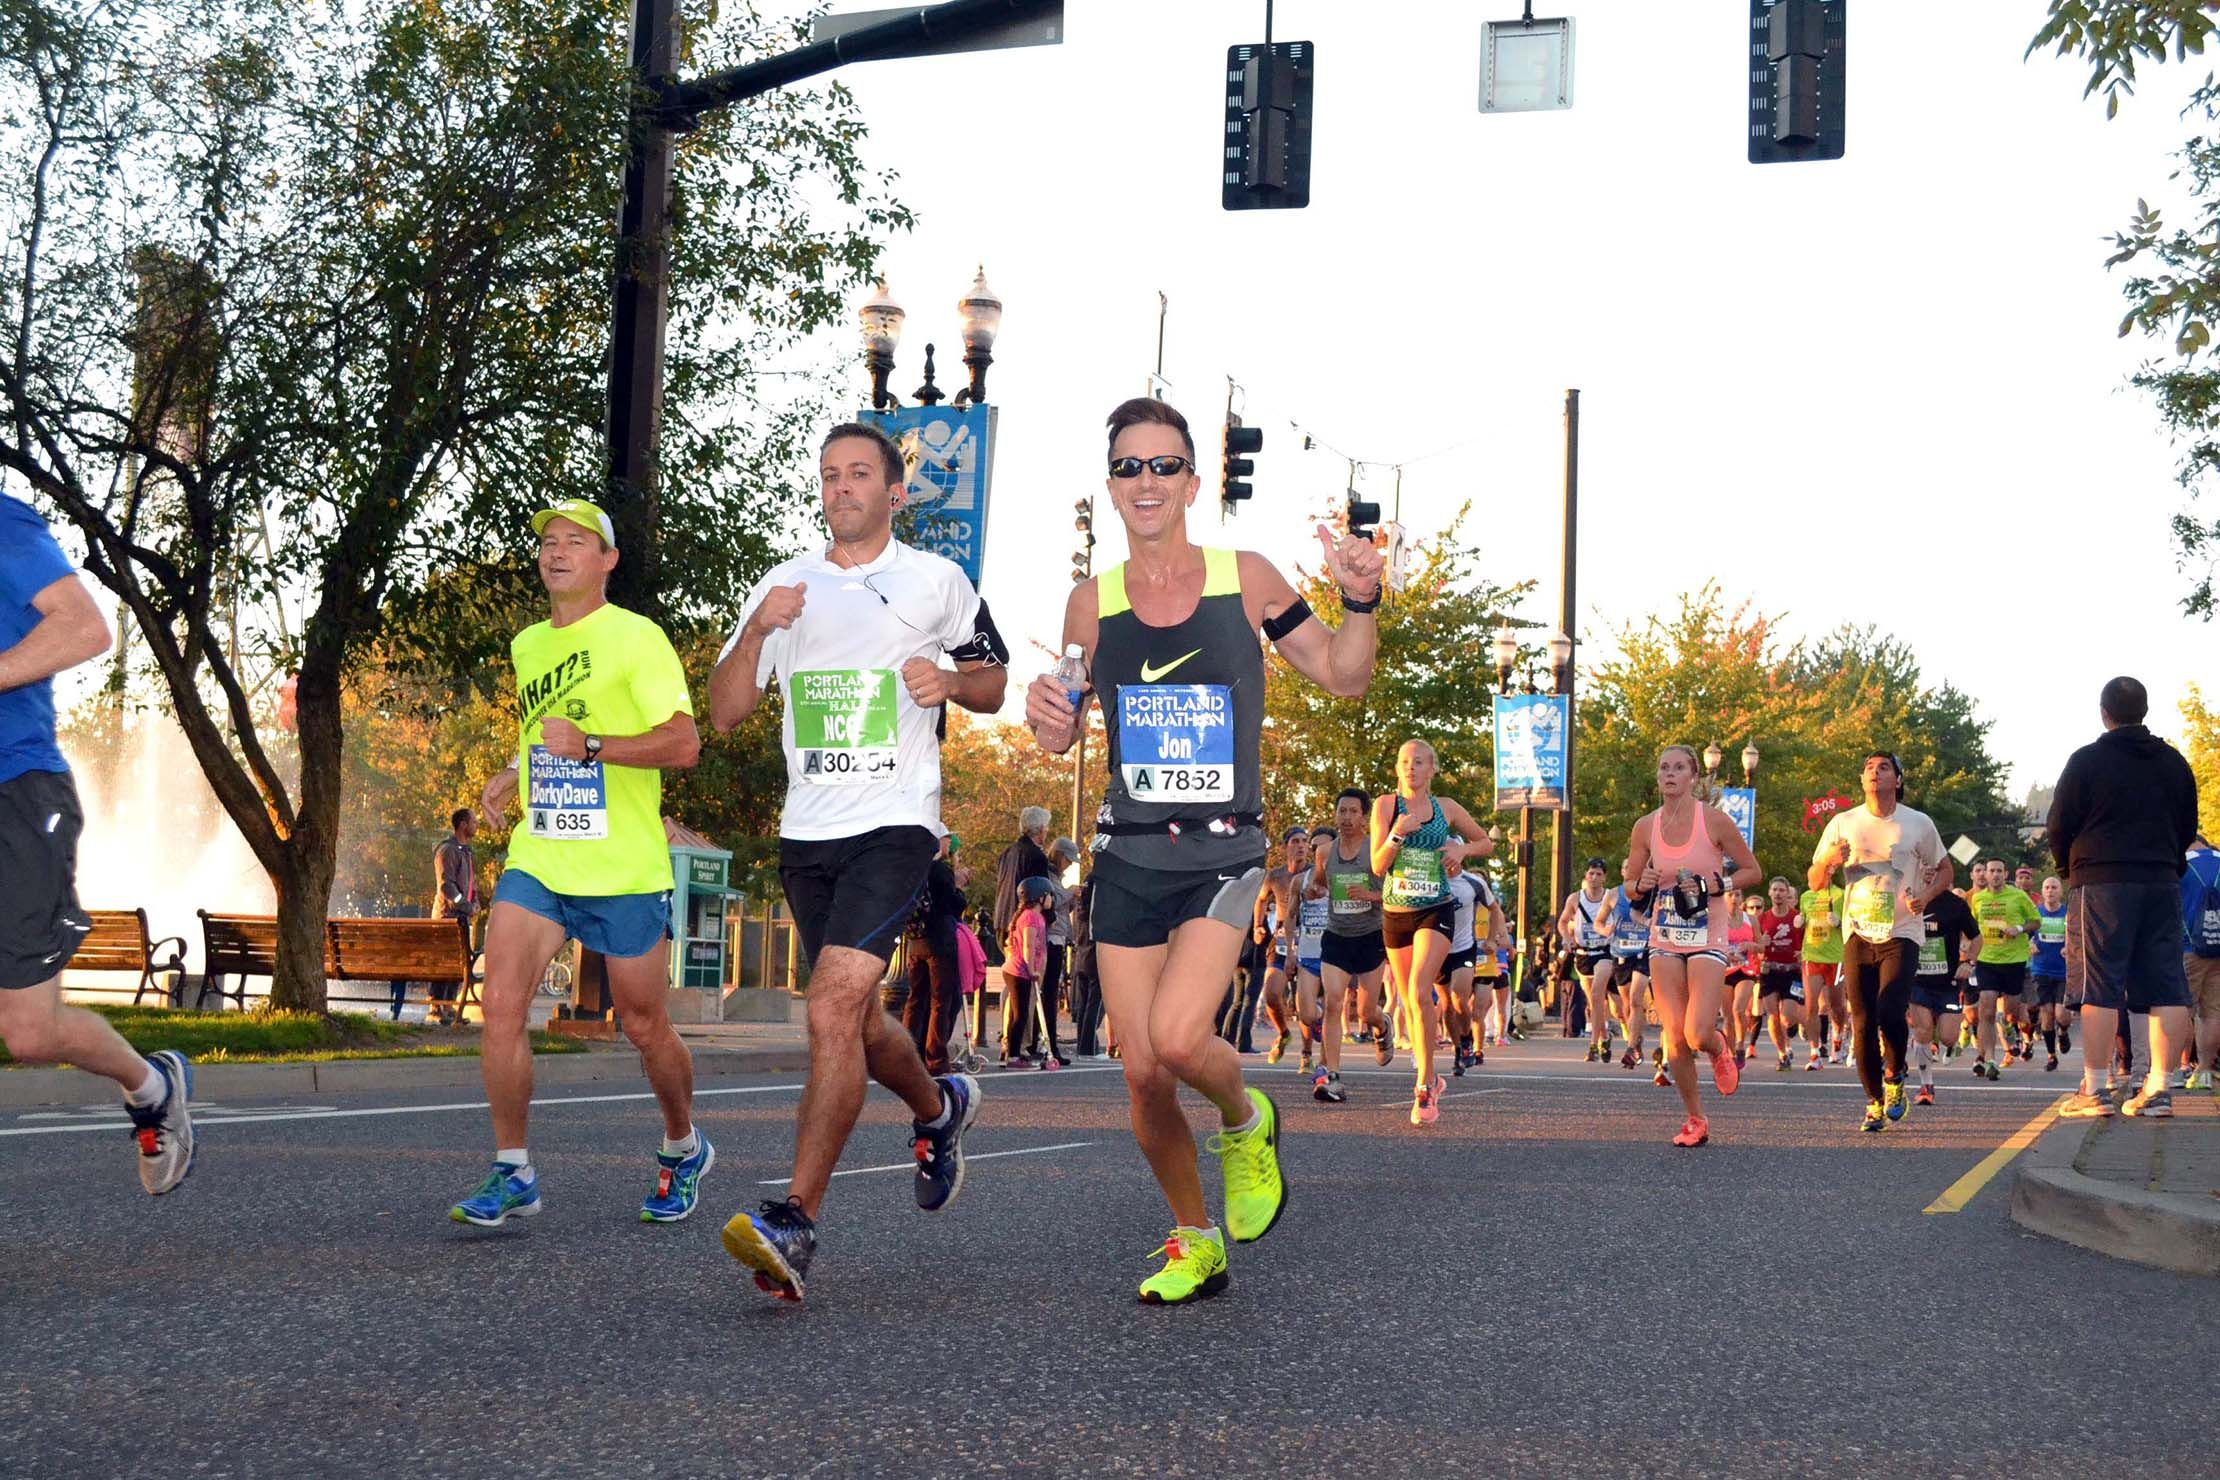 Bucket List 10 Waterfront Races Runners World